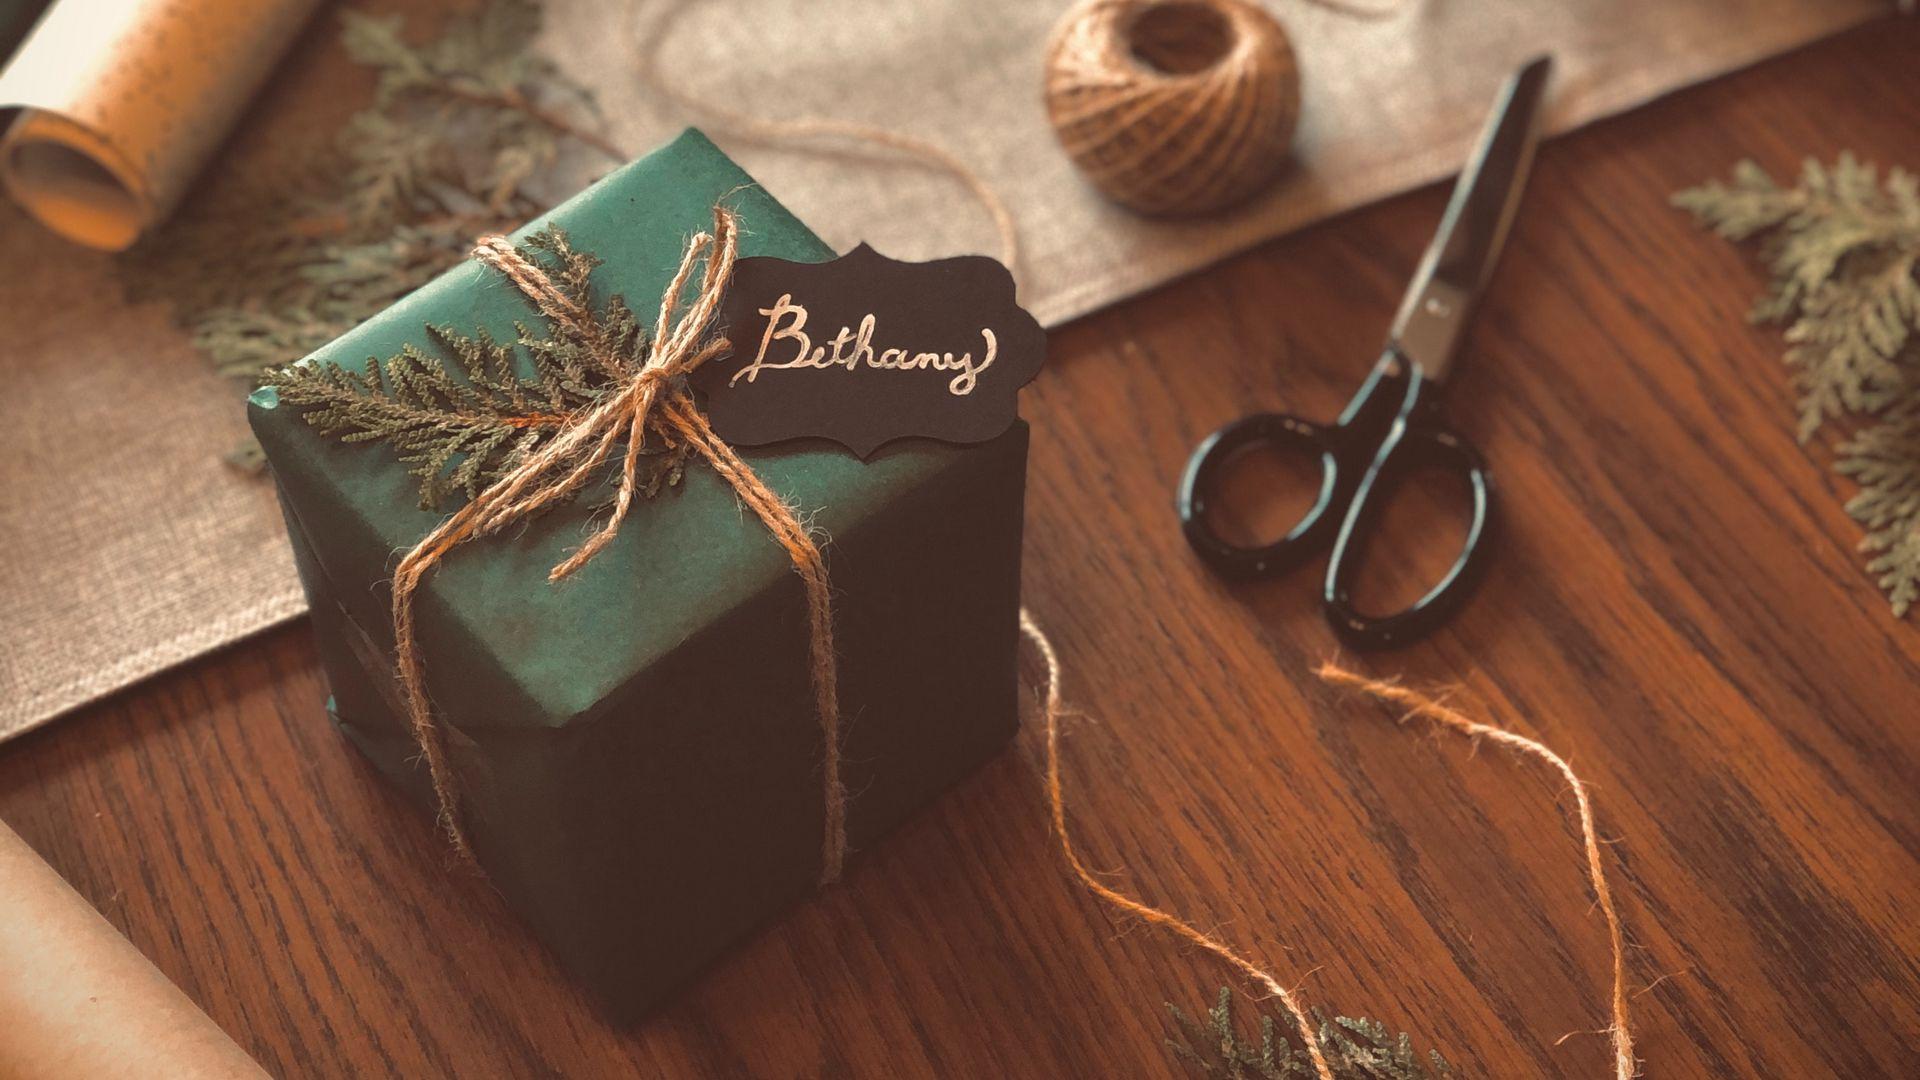 1920x1080 Wallpaper gift, box, scissors, threads, branches